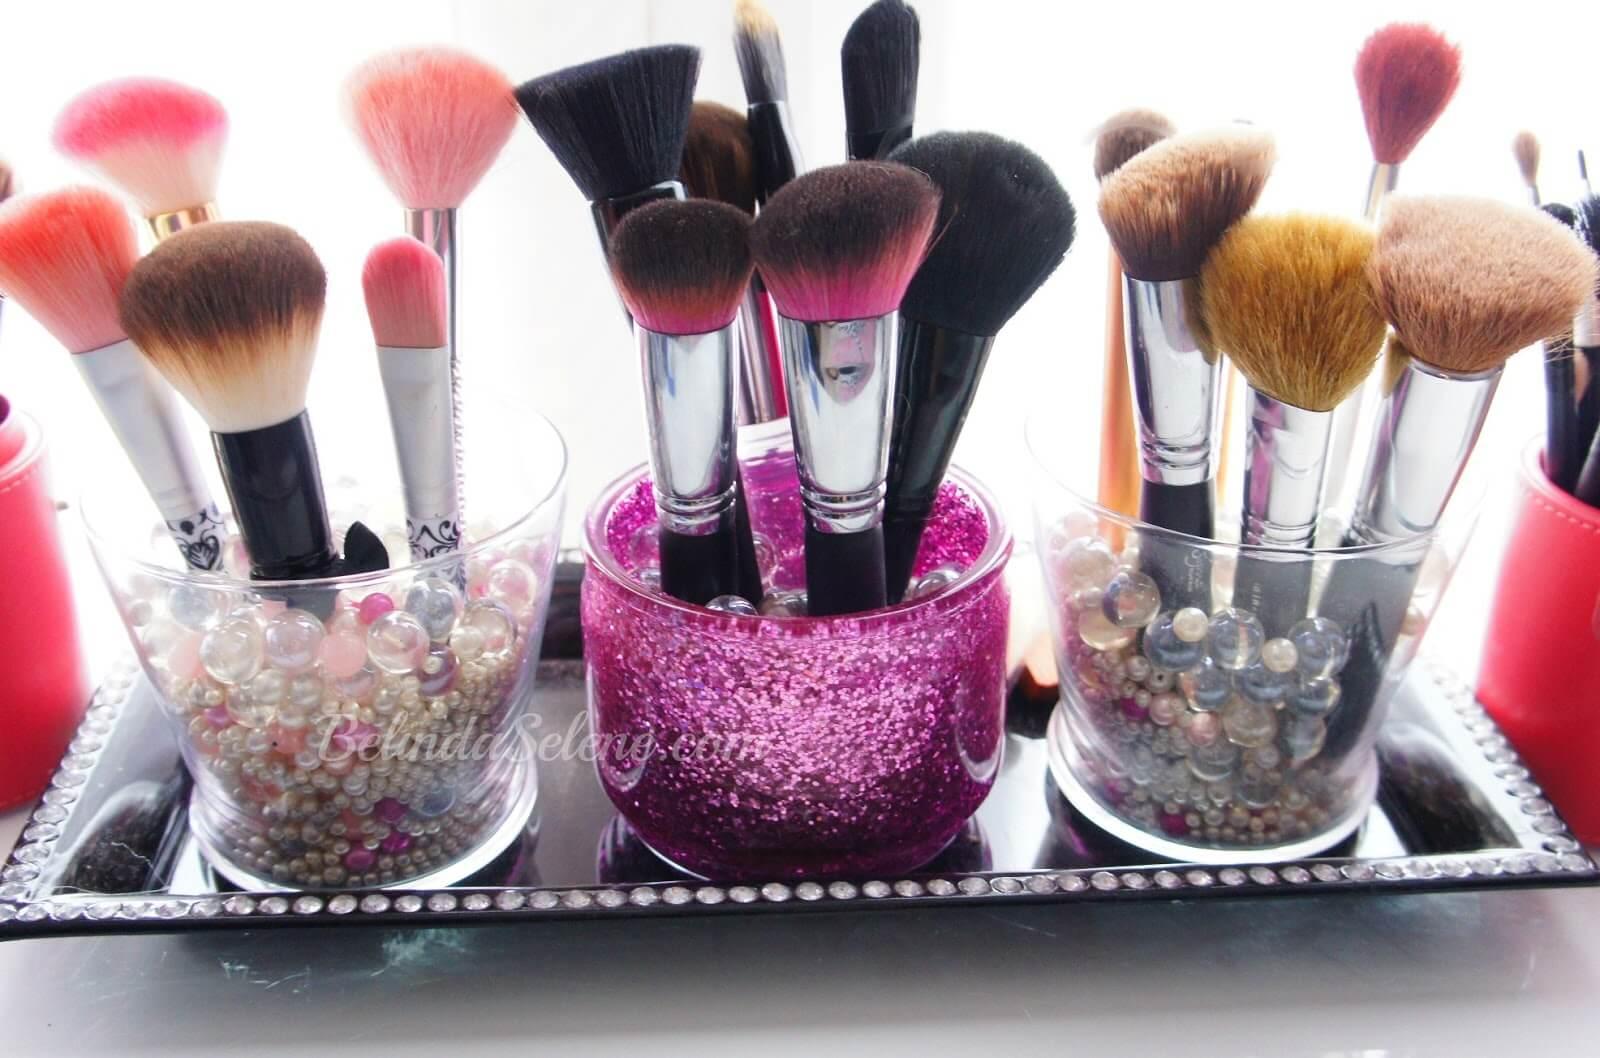 Glam-Tastic Makeup Brush Storage Tray